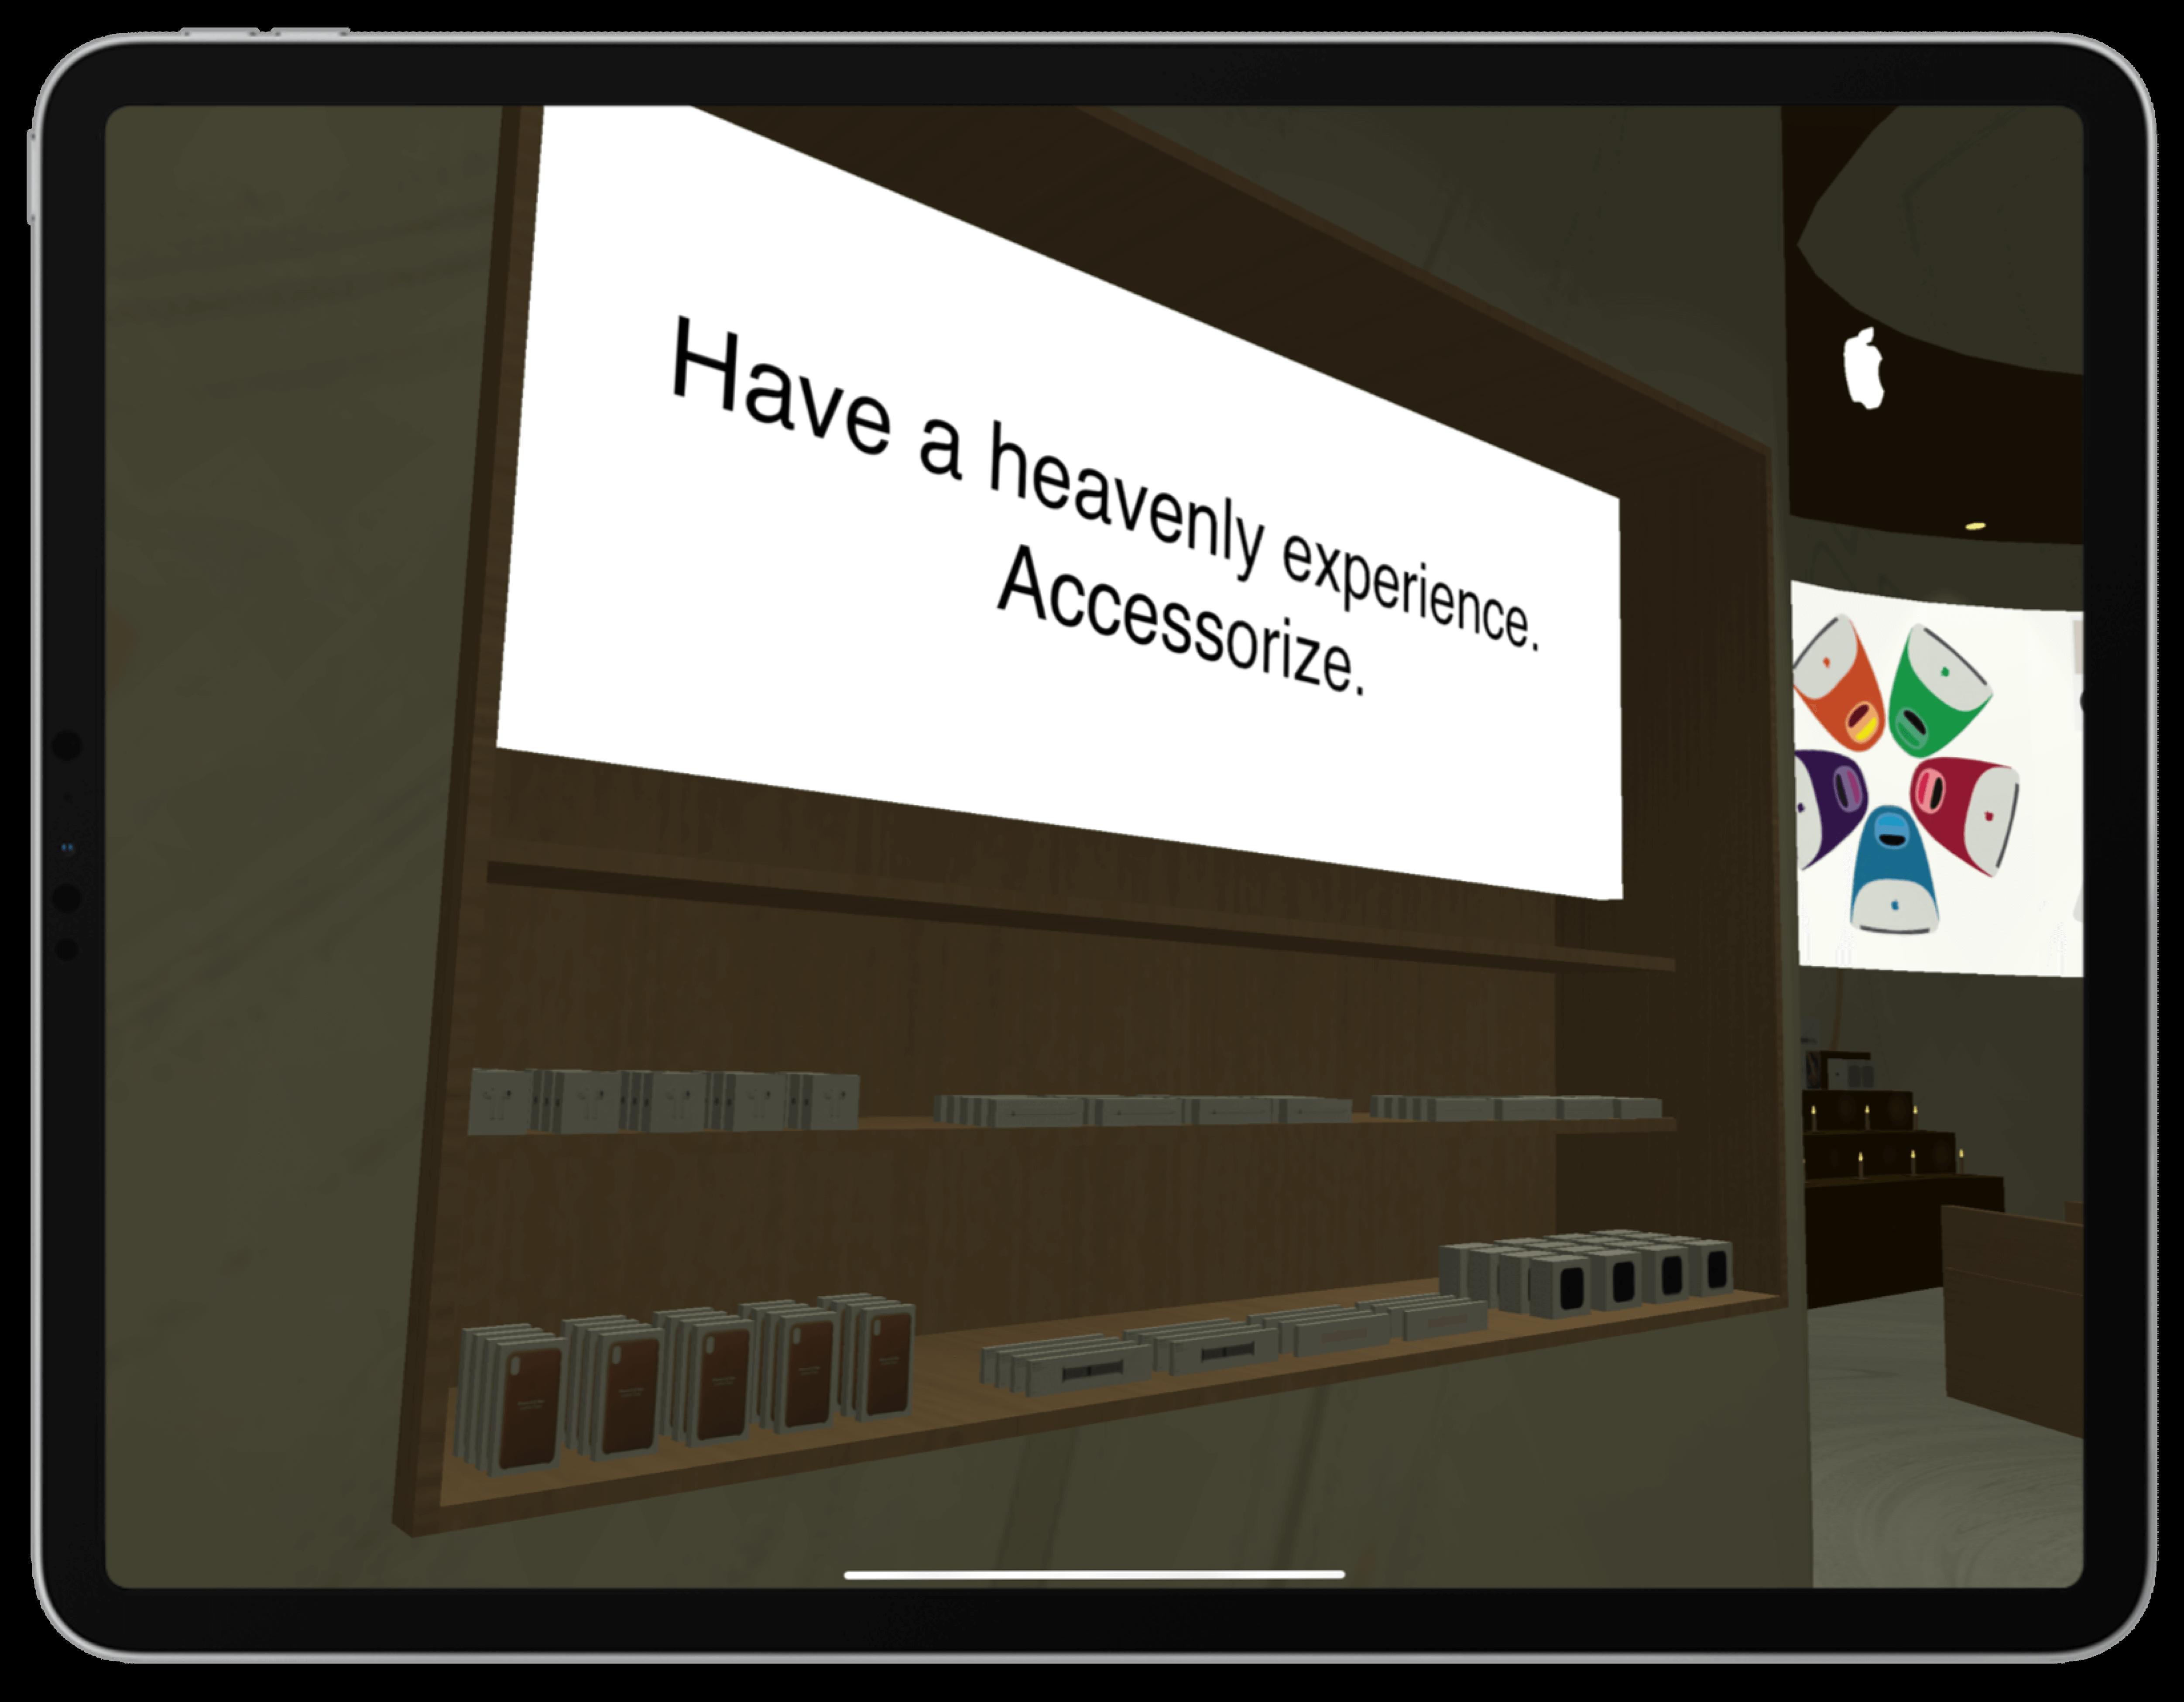 Apple Chapel Accessorize Screenshot | Toby Everett